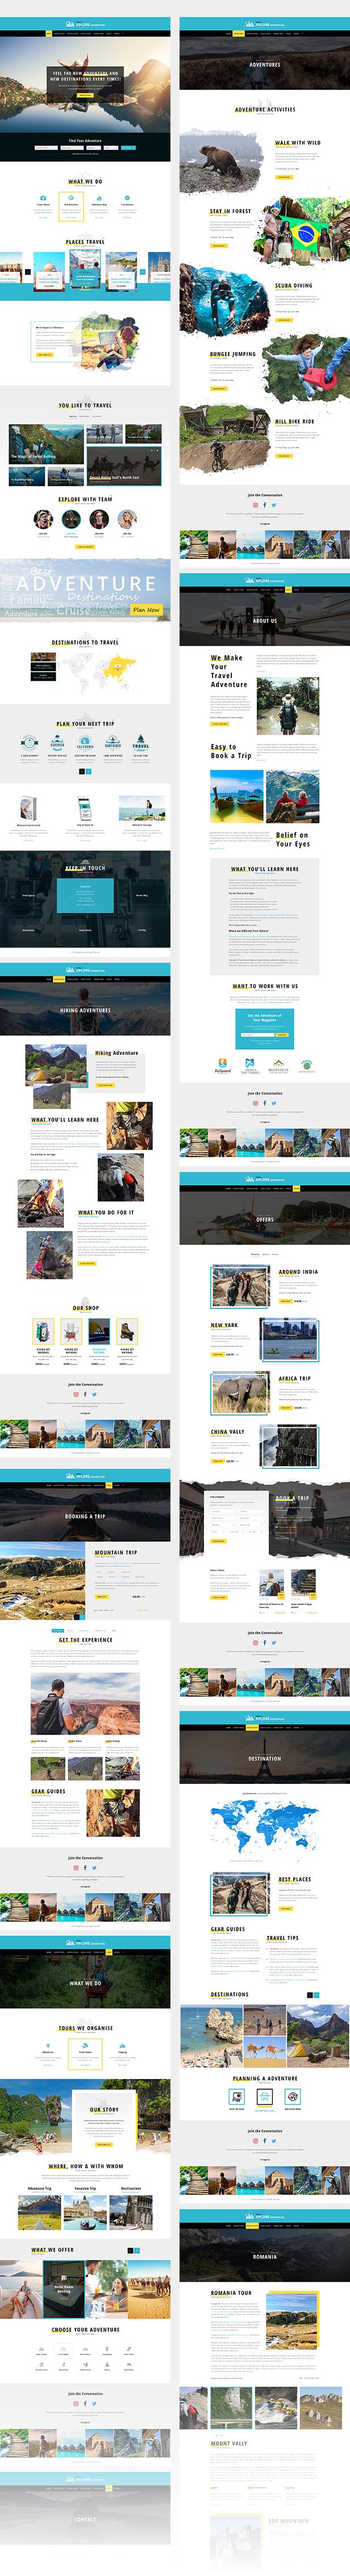 Xplore - Adventure and Travel PSD Template - 1 Xplore – Adventure and Travel PSD Template Nulled Free Download promo